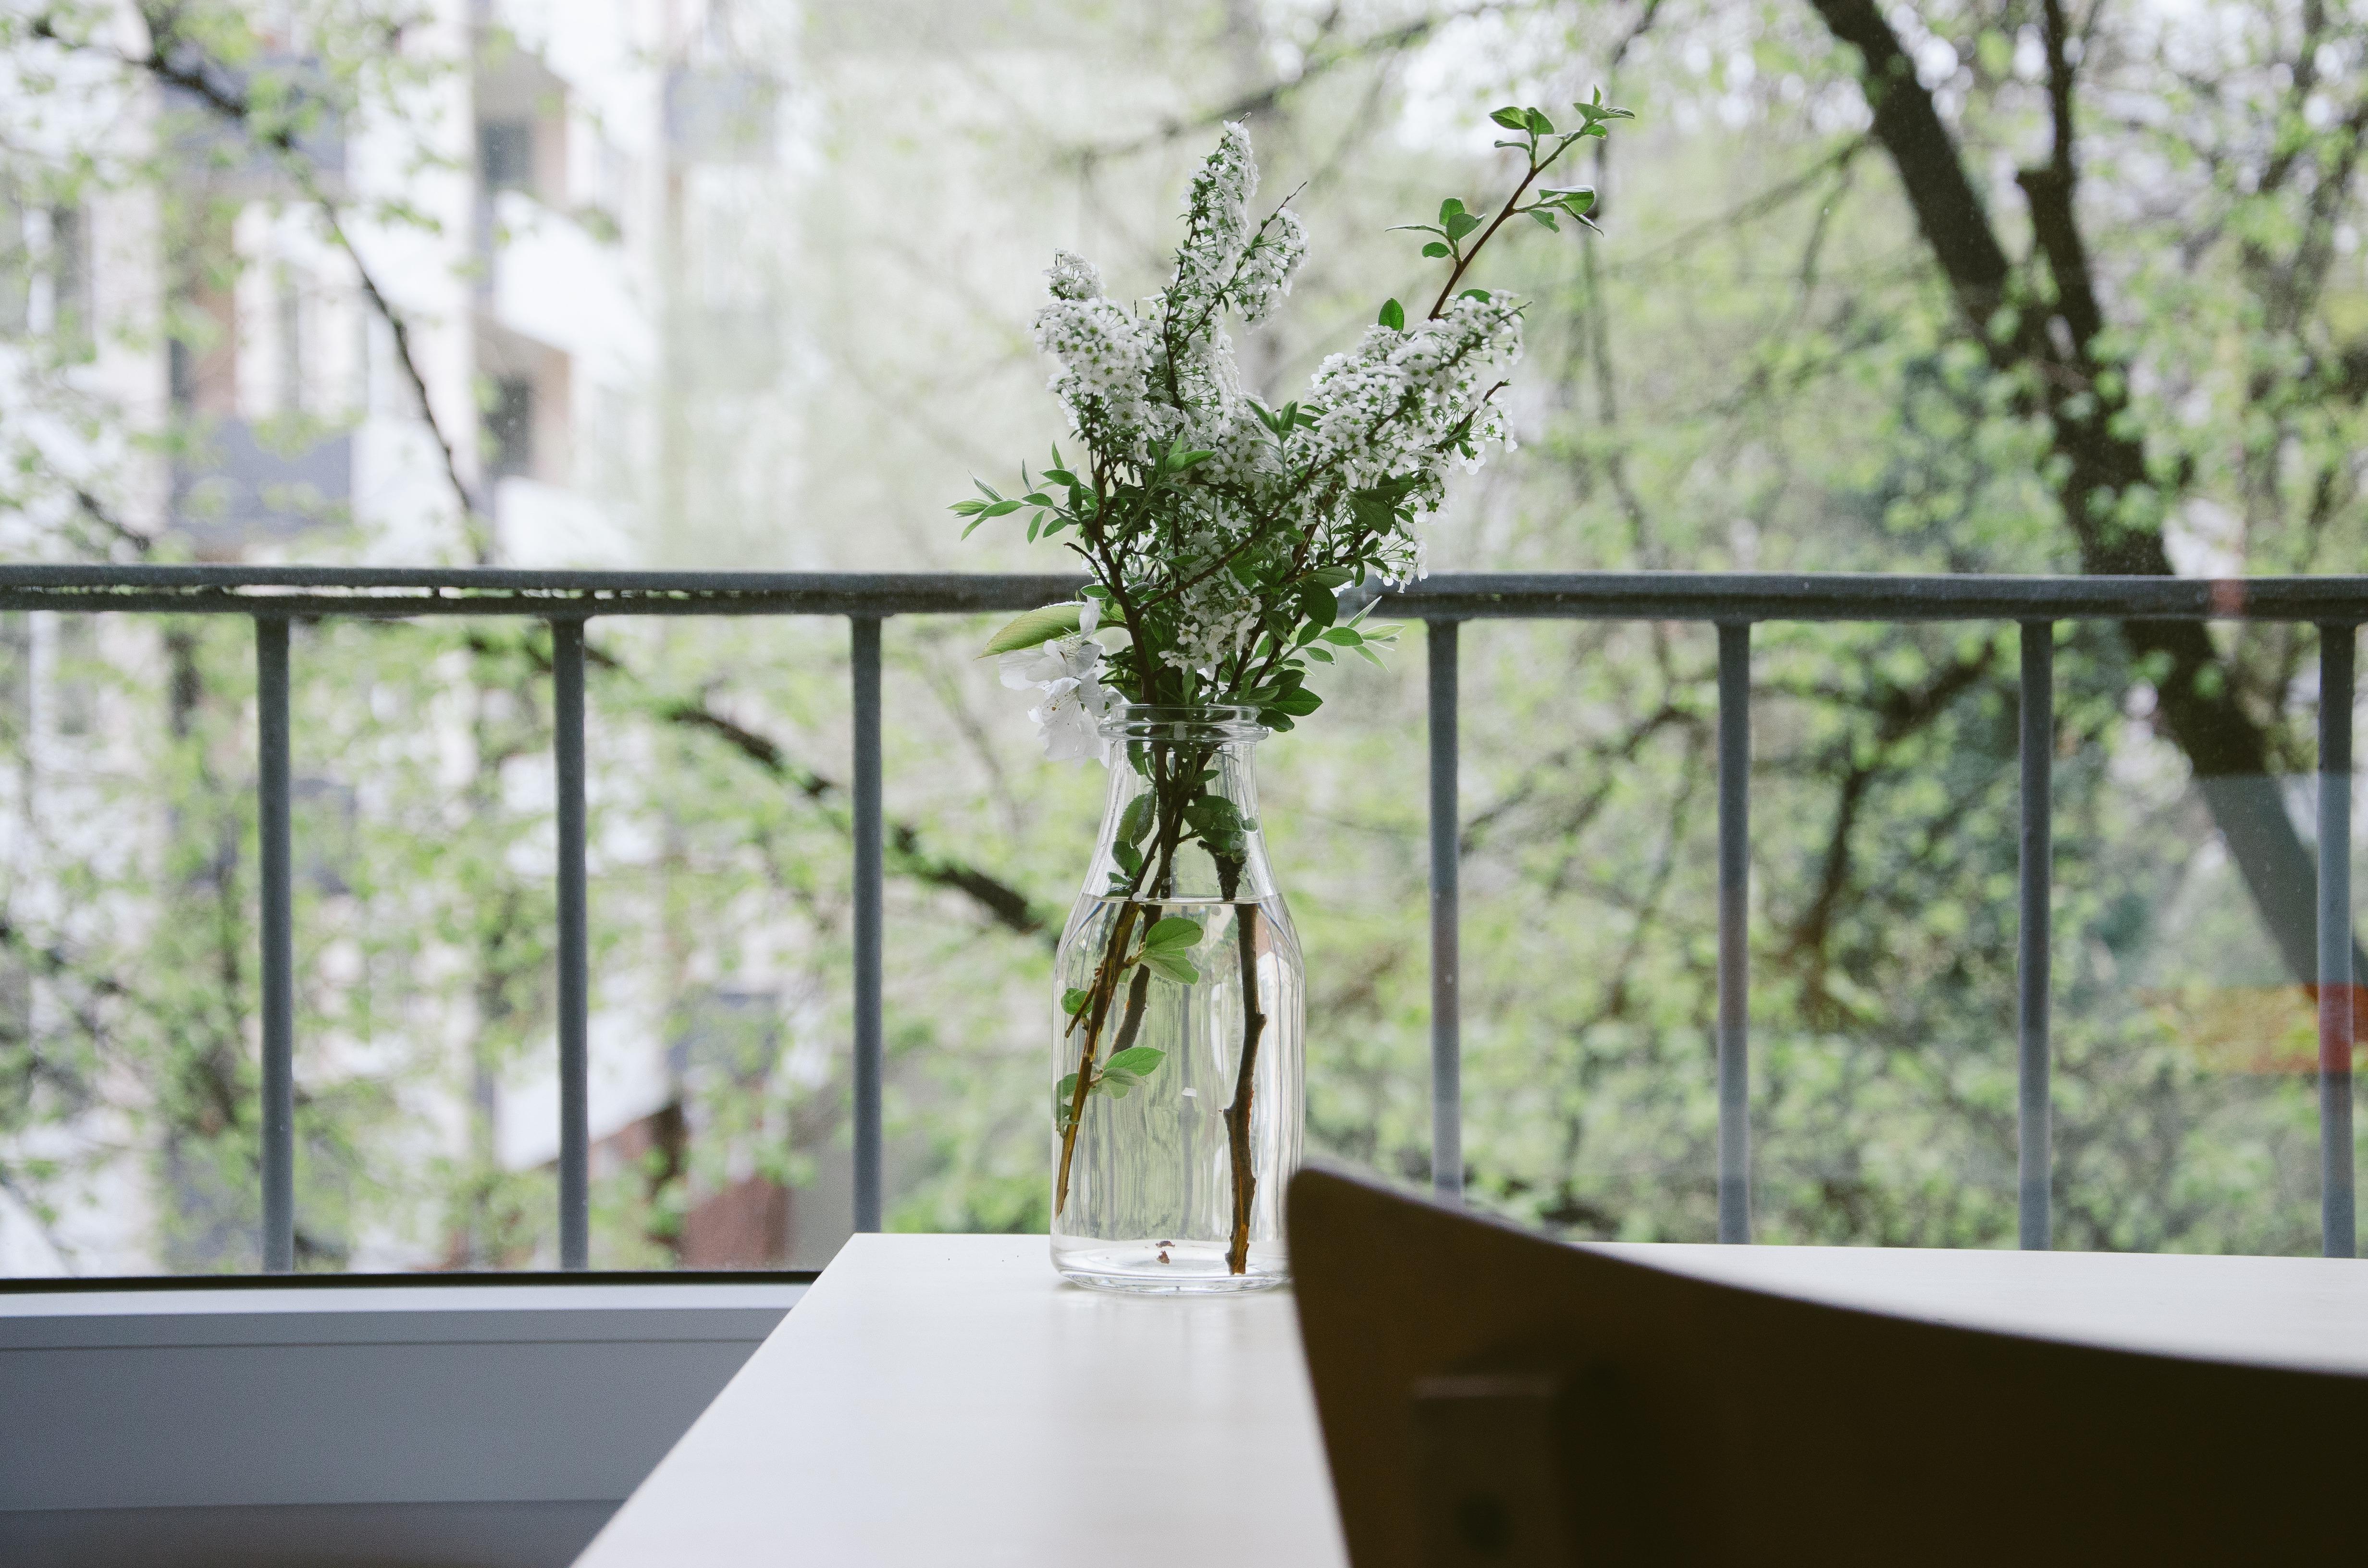 ... rumah batang daun bunga berkembang kaca Perkotaan Bunga balkon susuran tangga musim semi hijau herba alam botani pertanian desain ... & Gambar : meja air cabang mekar menanam rumah batang daun ...